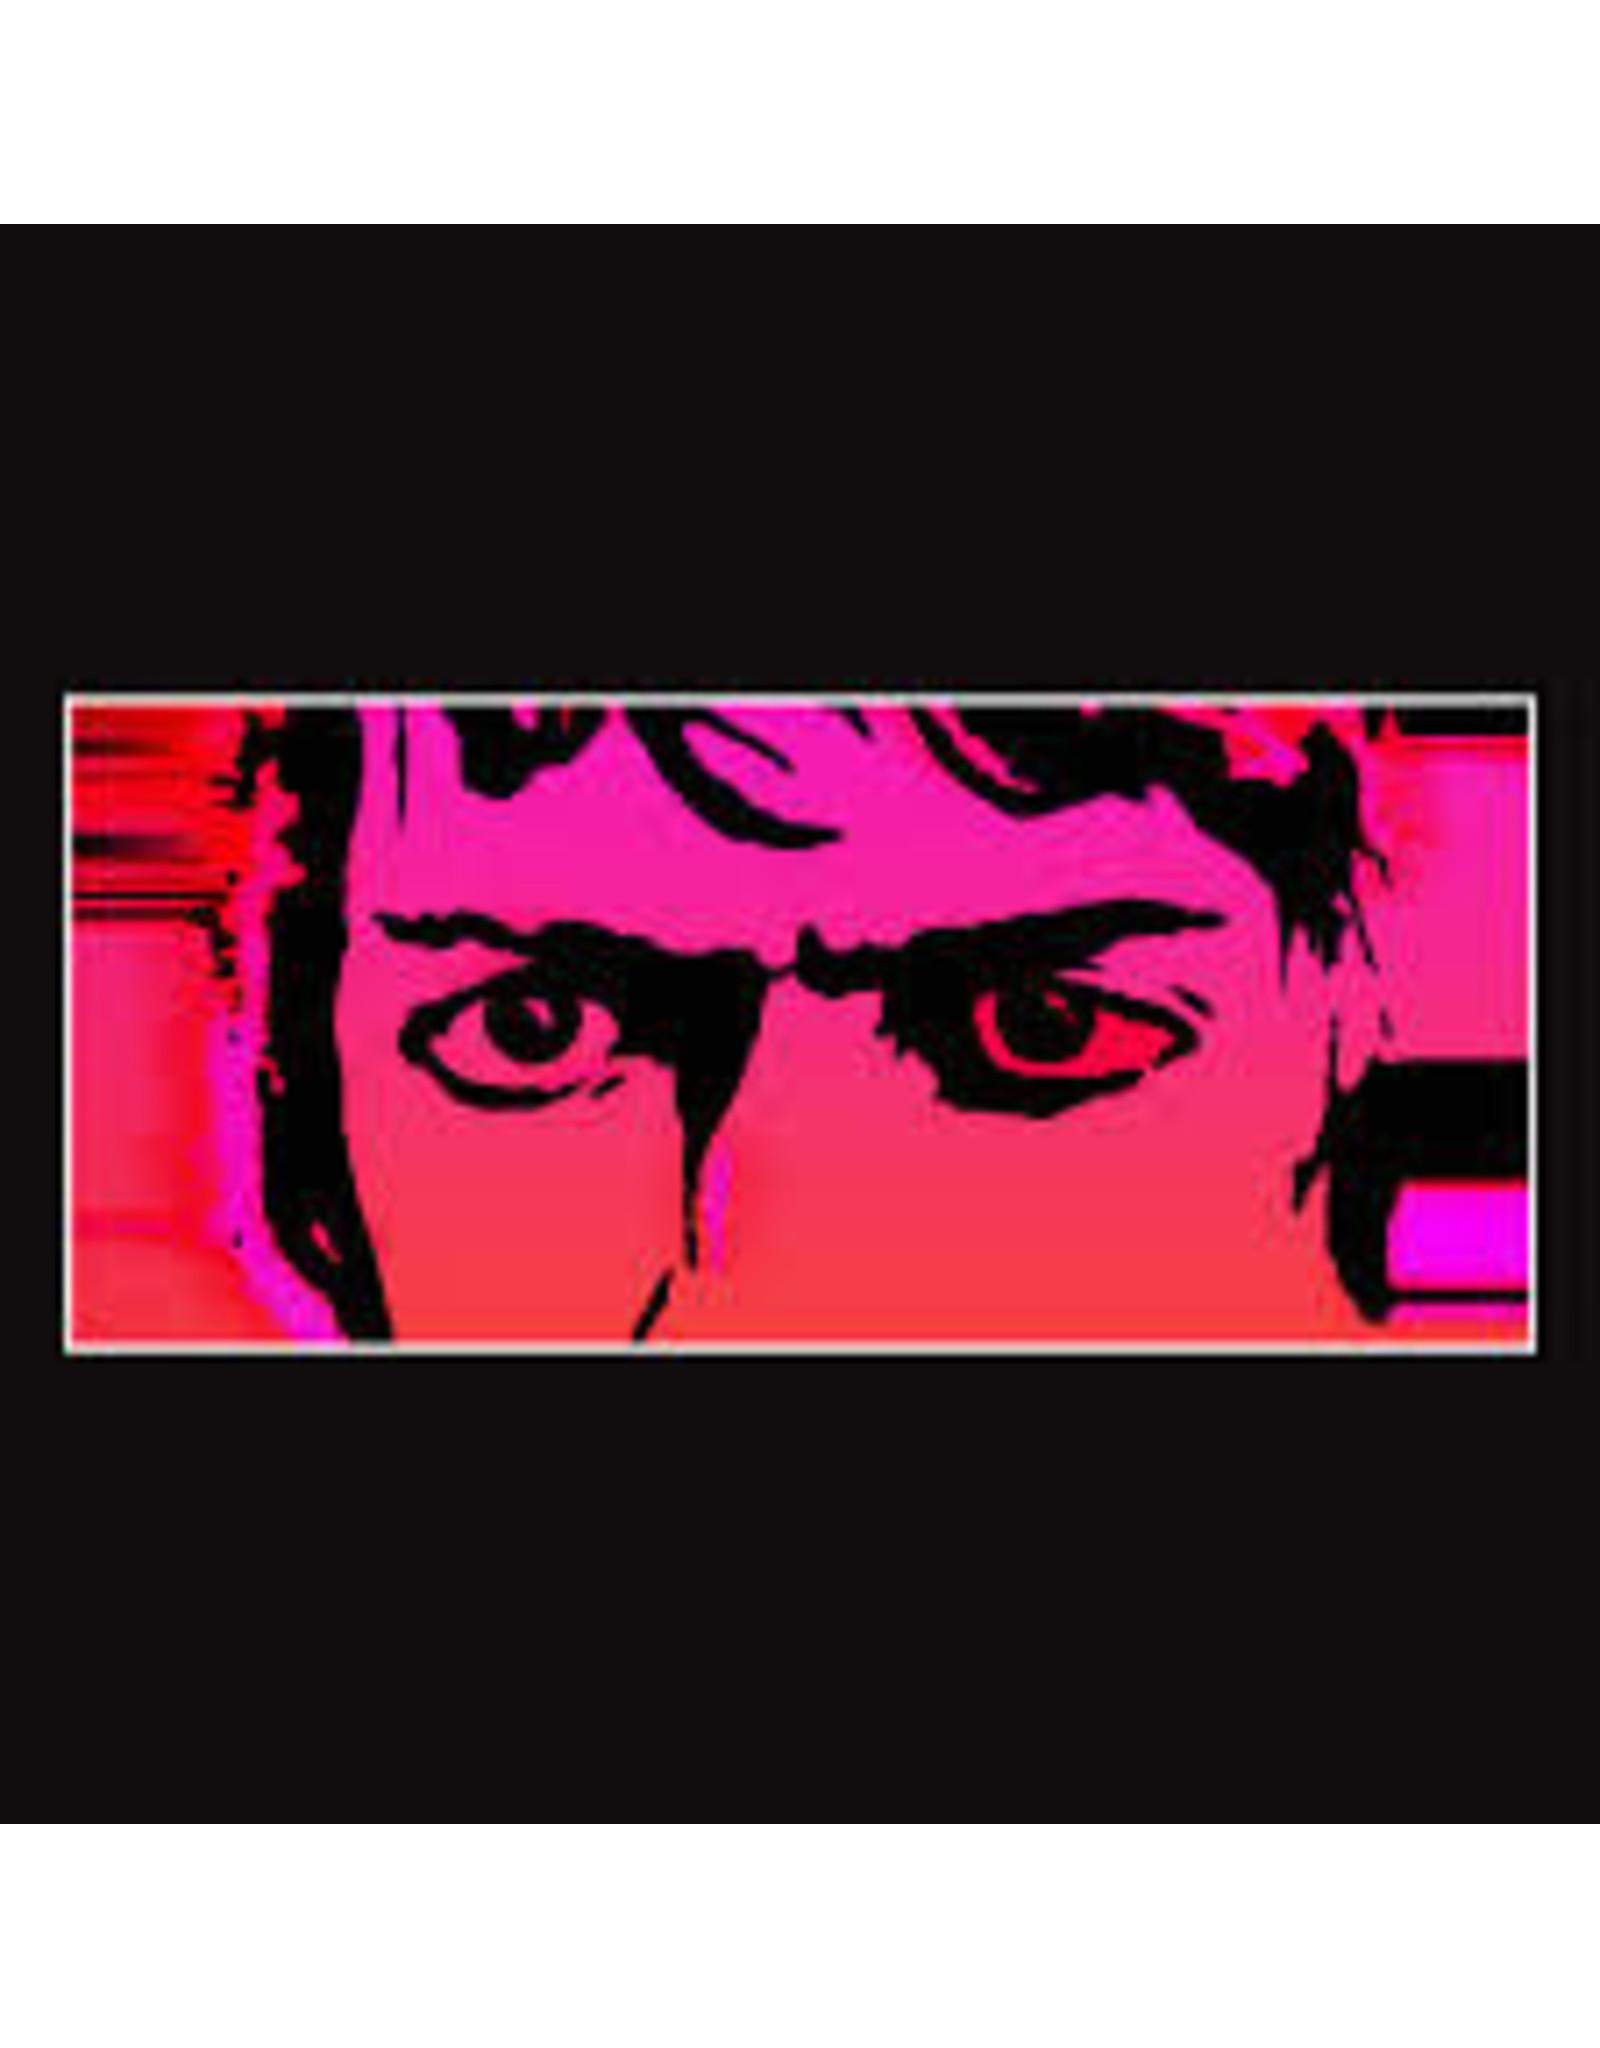 Delicate Steve - Till I Burn Up LP